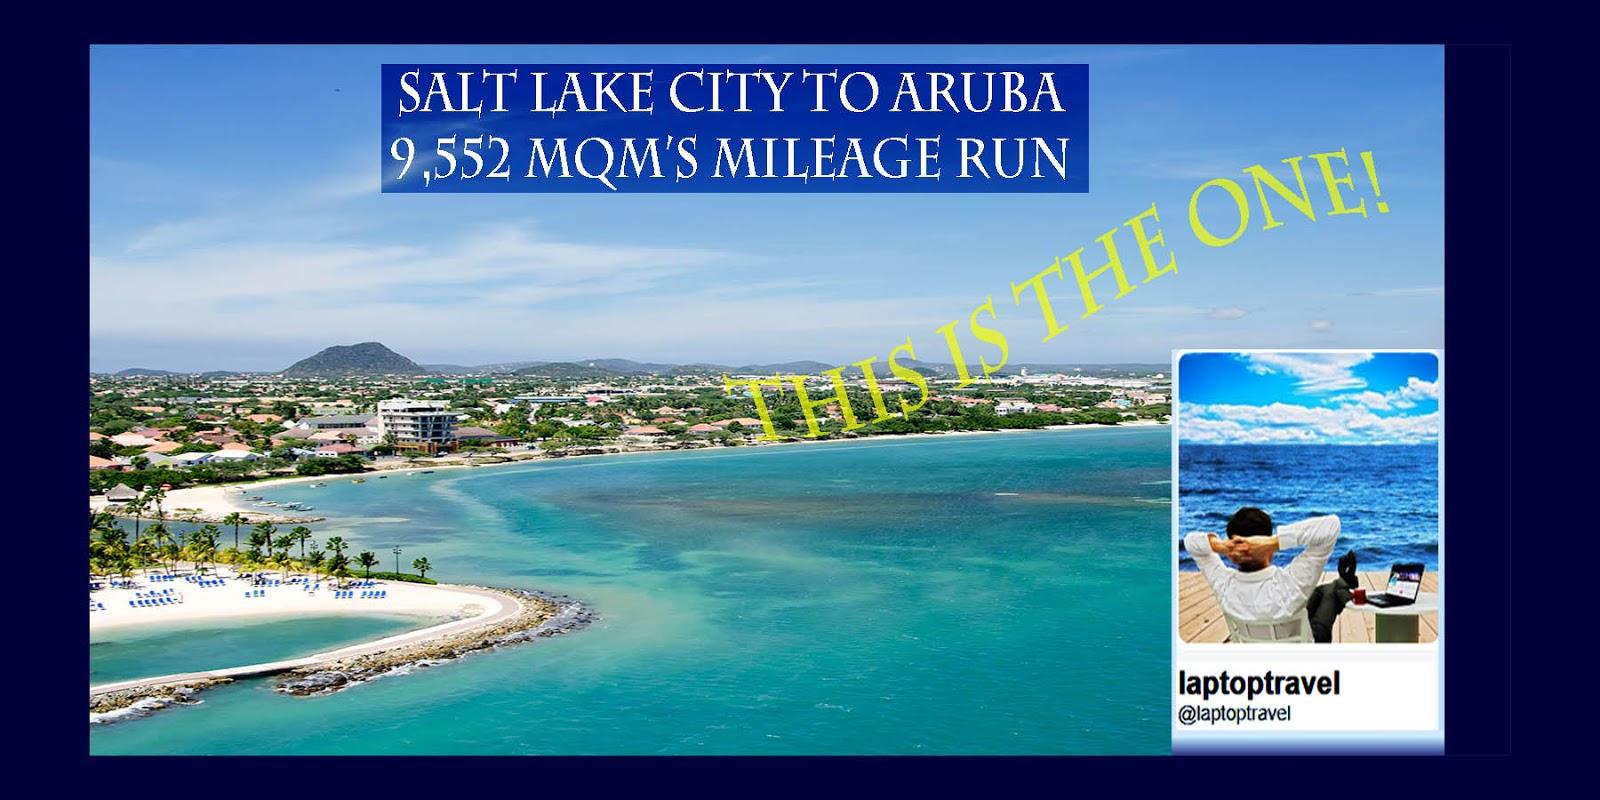 Mileage Run Mini Vacation